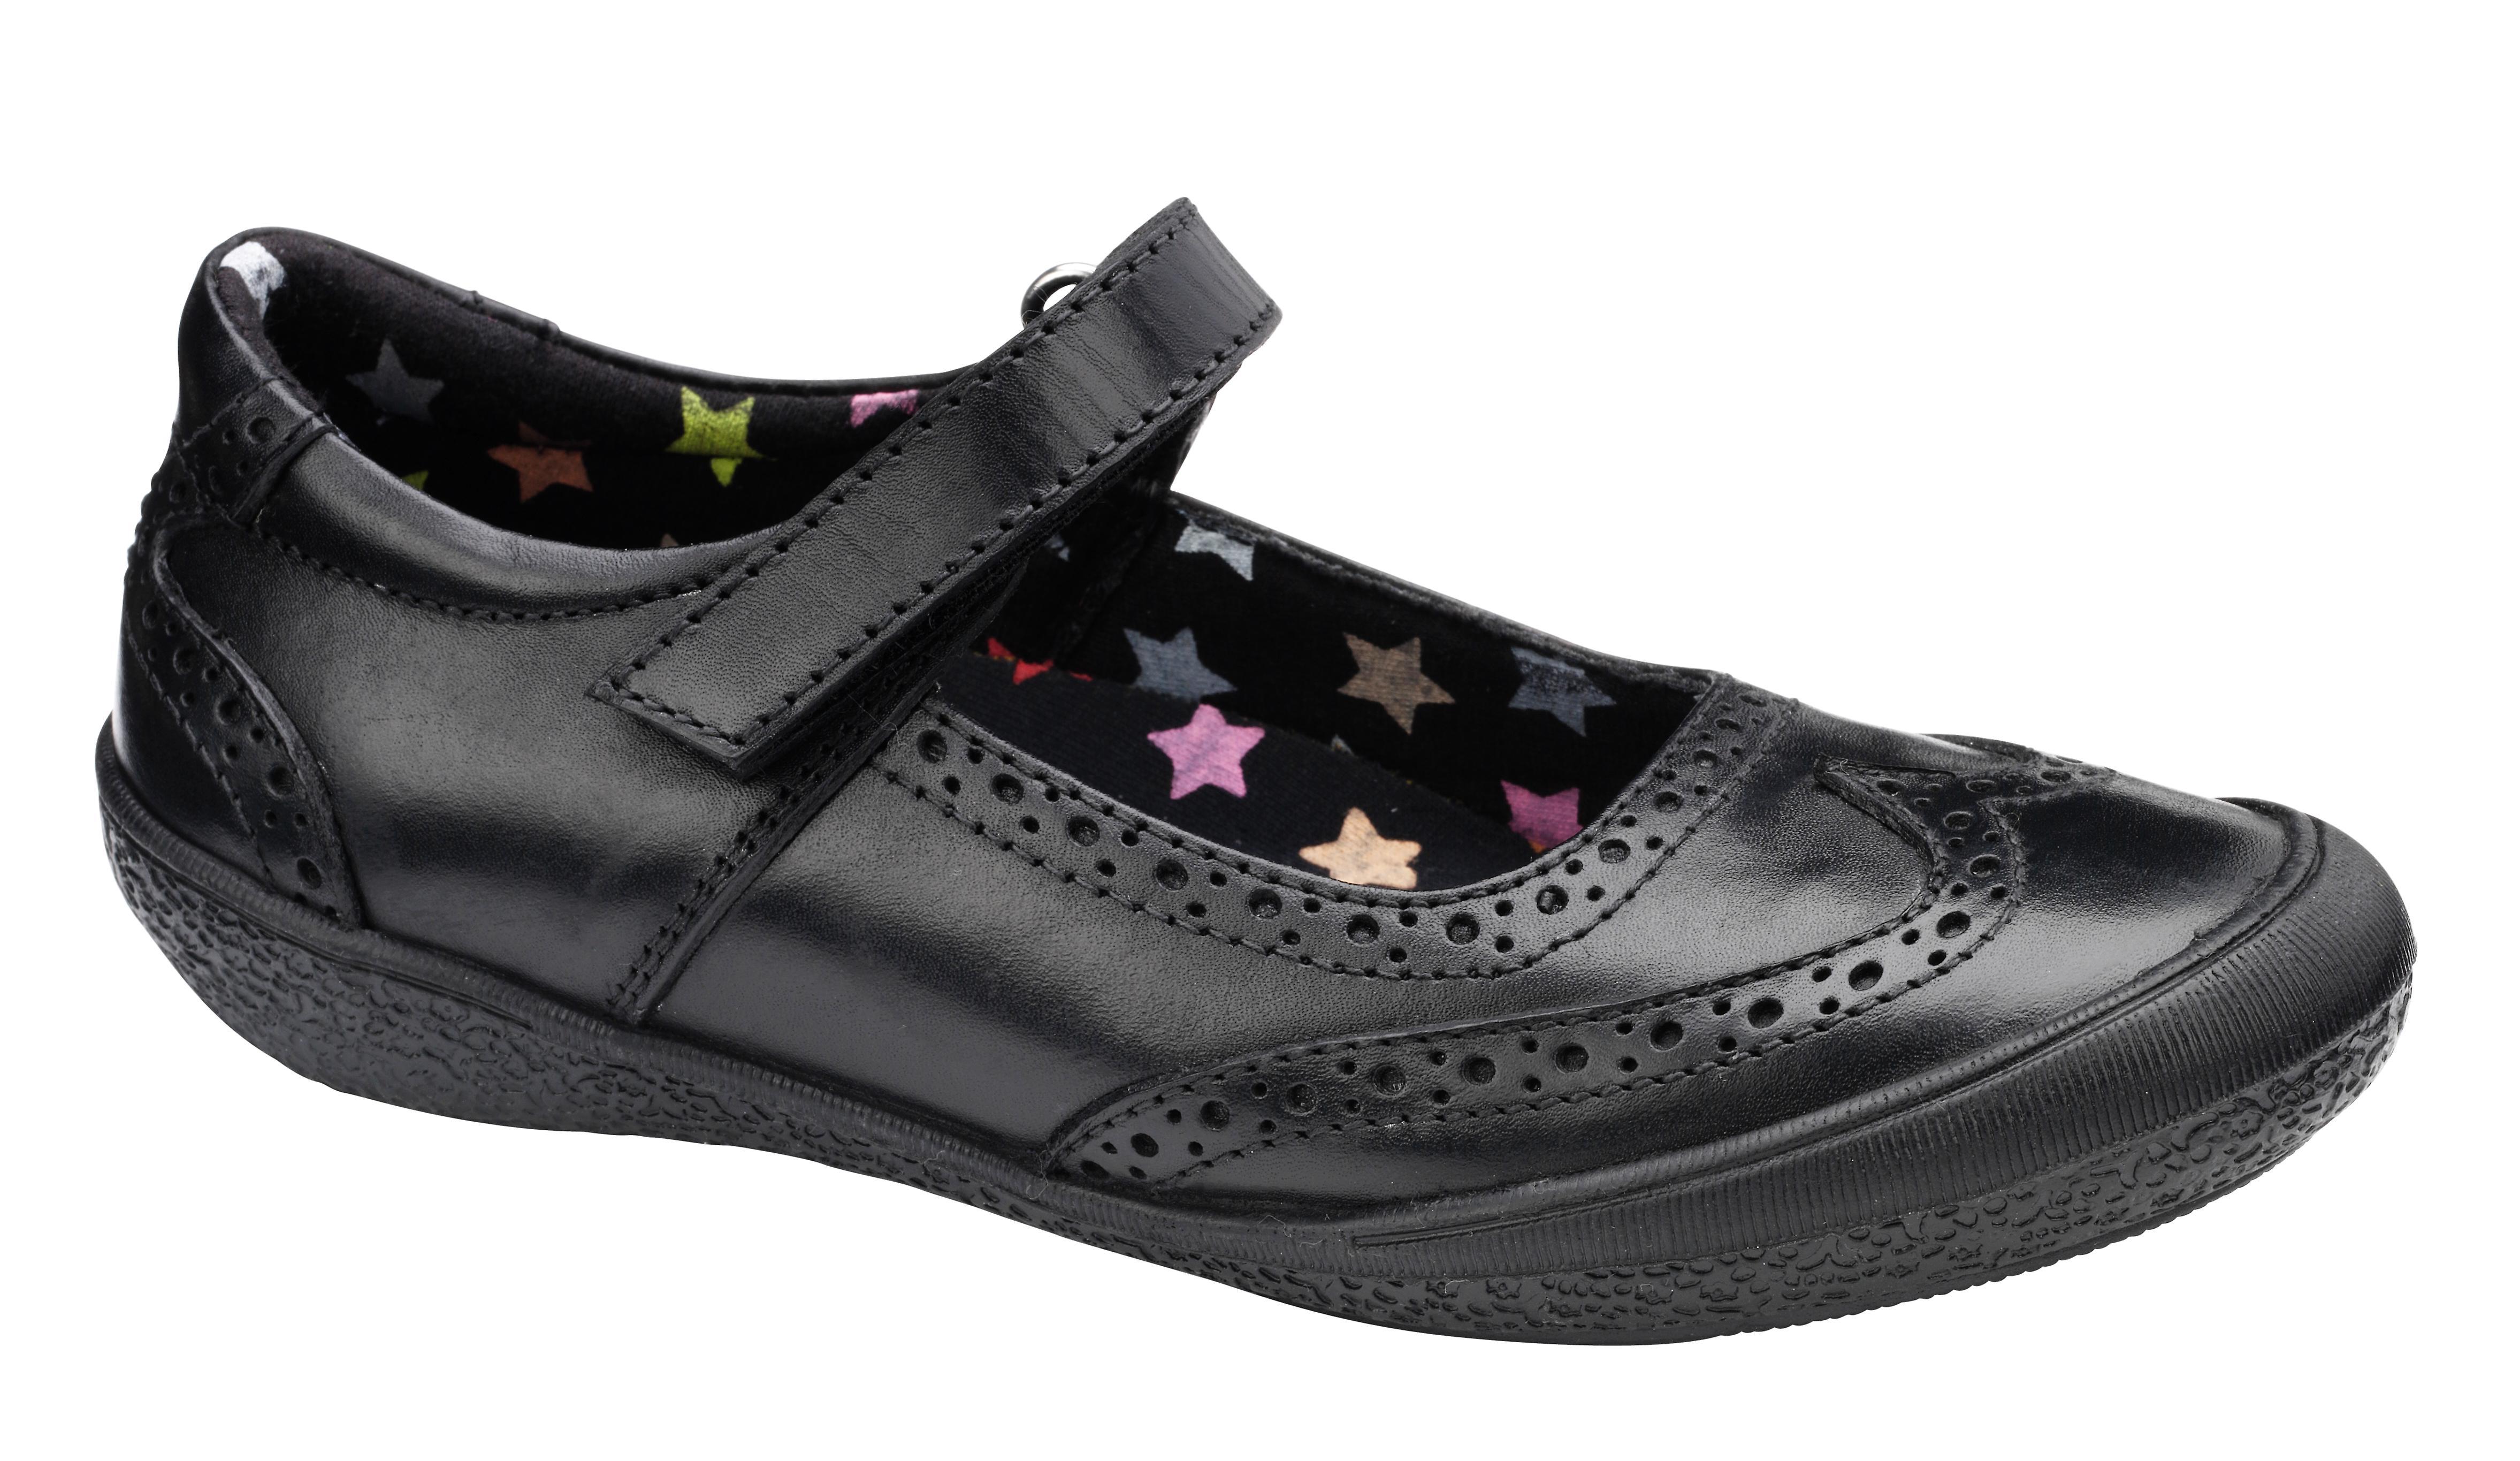 Hush Puppies Girls Amerany School chaussures noir F Fitting